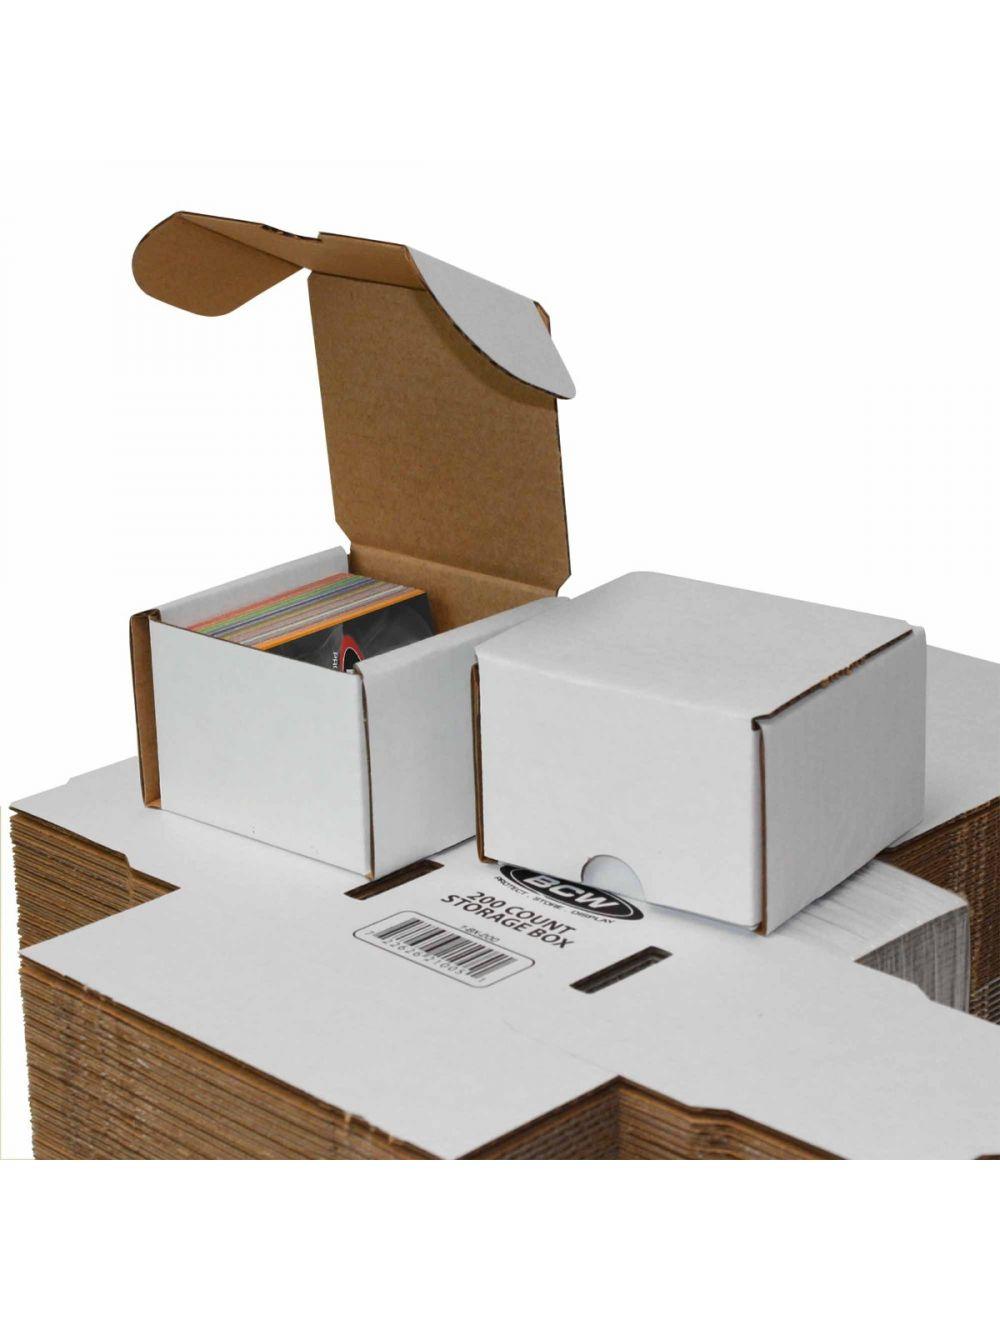 200 Count Storage Box